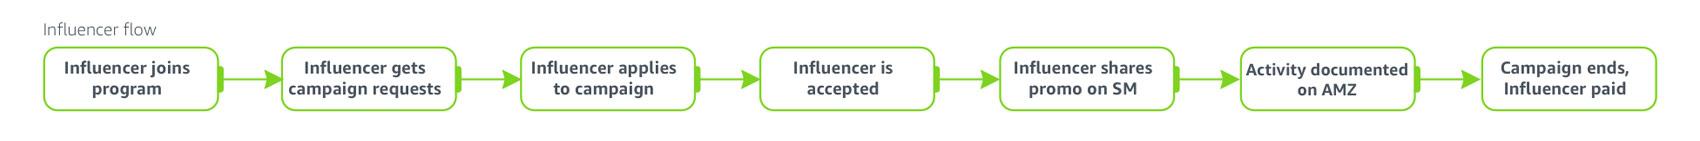 influencer_flow.jpg